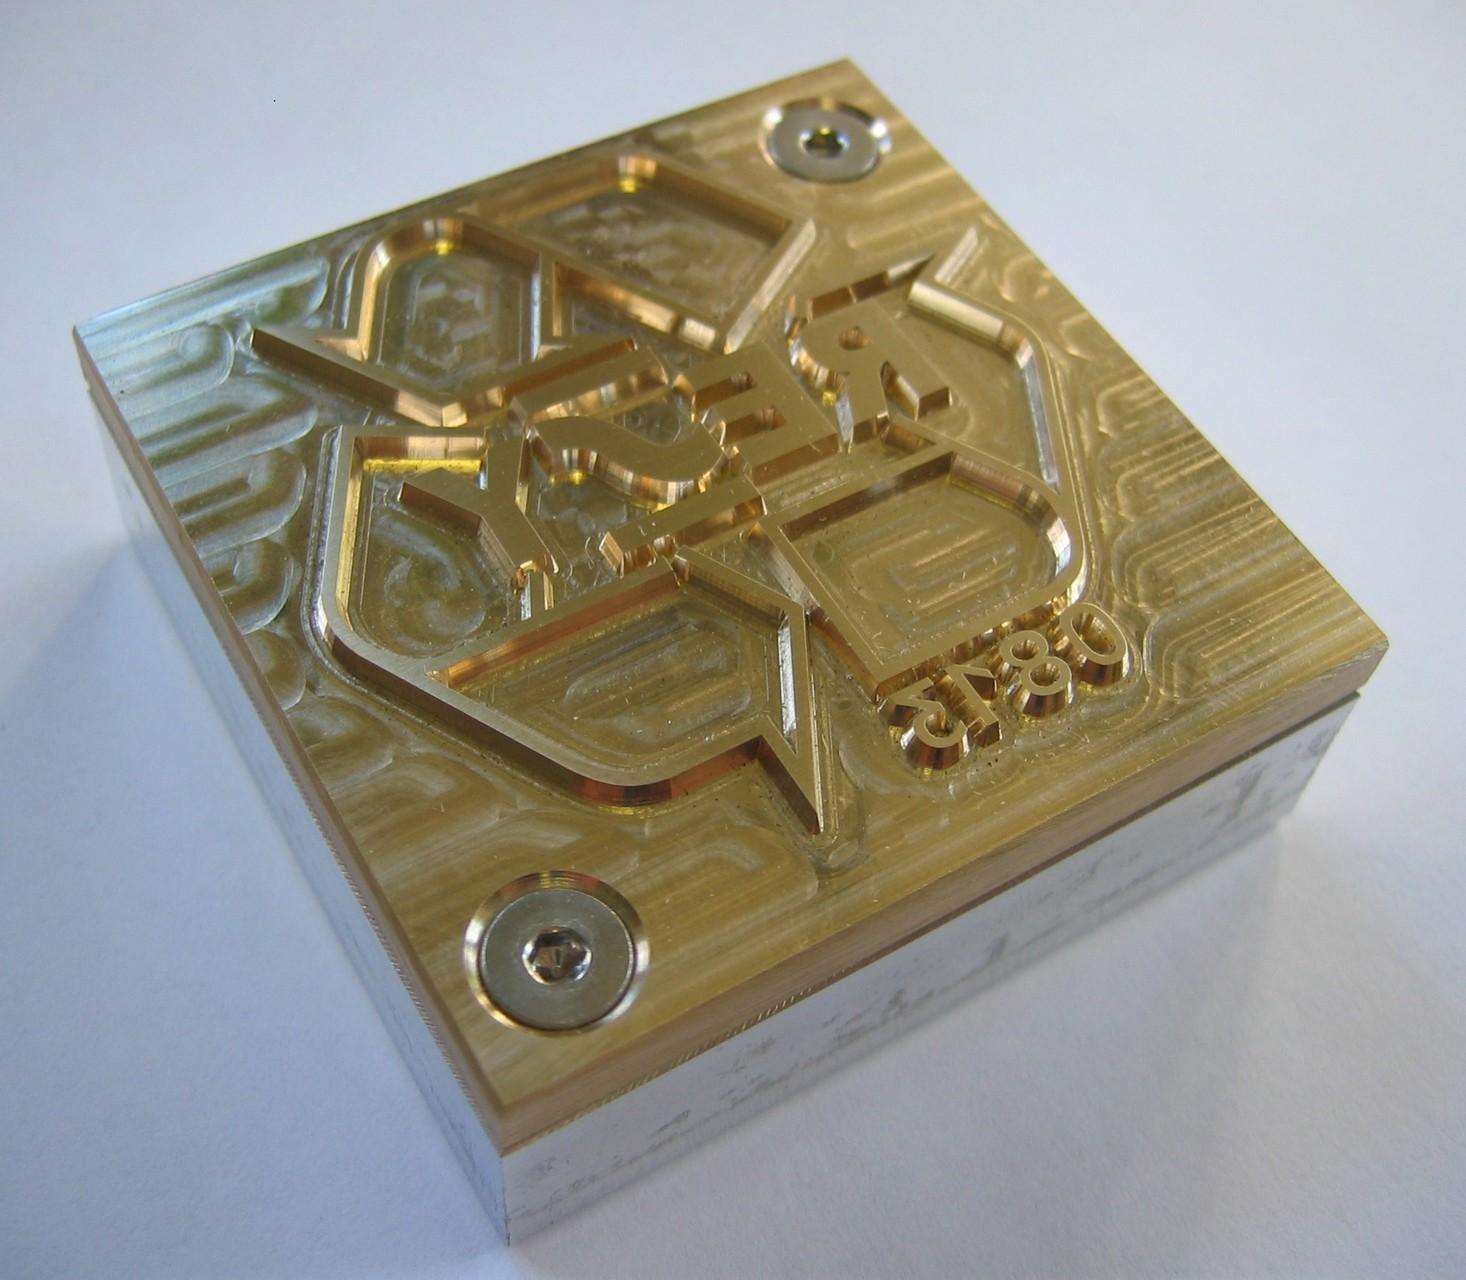 Heißprägestempel mit Aluminium-Fundament, Heißfolienstempel, Heißfolienprägestempel, Golddruckstempel, Lederprägestempel, Folienprägestempel, Heißprägewerkzeug